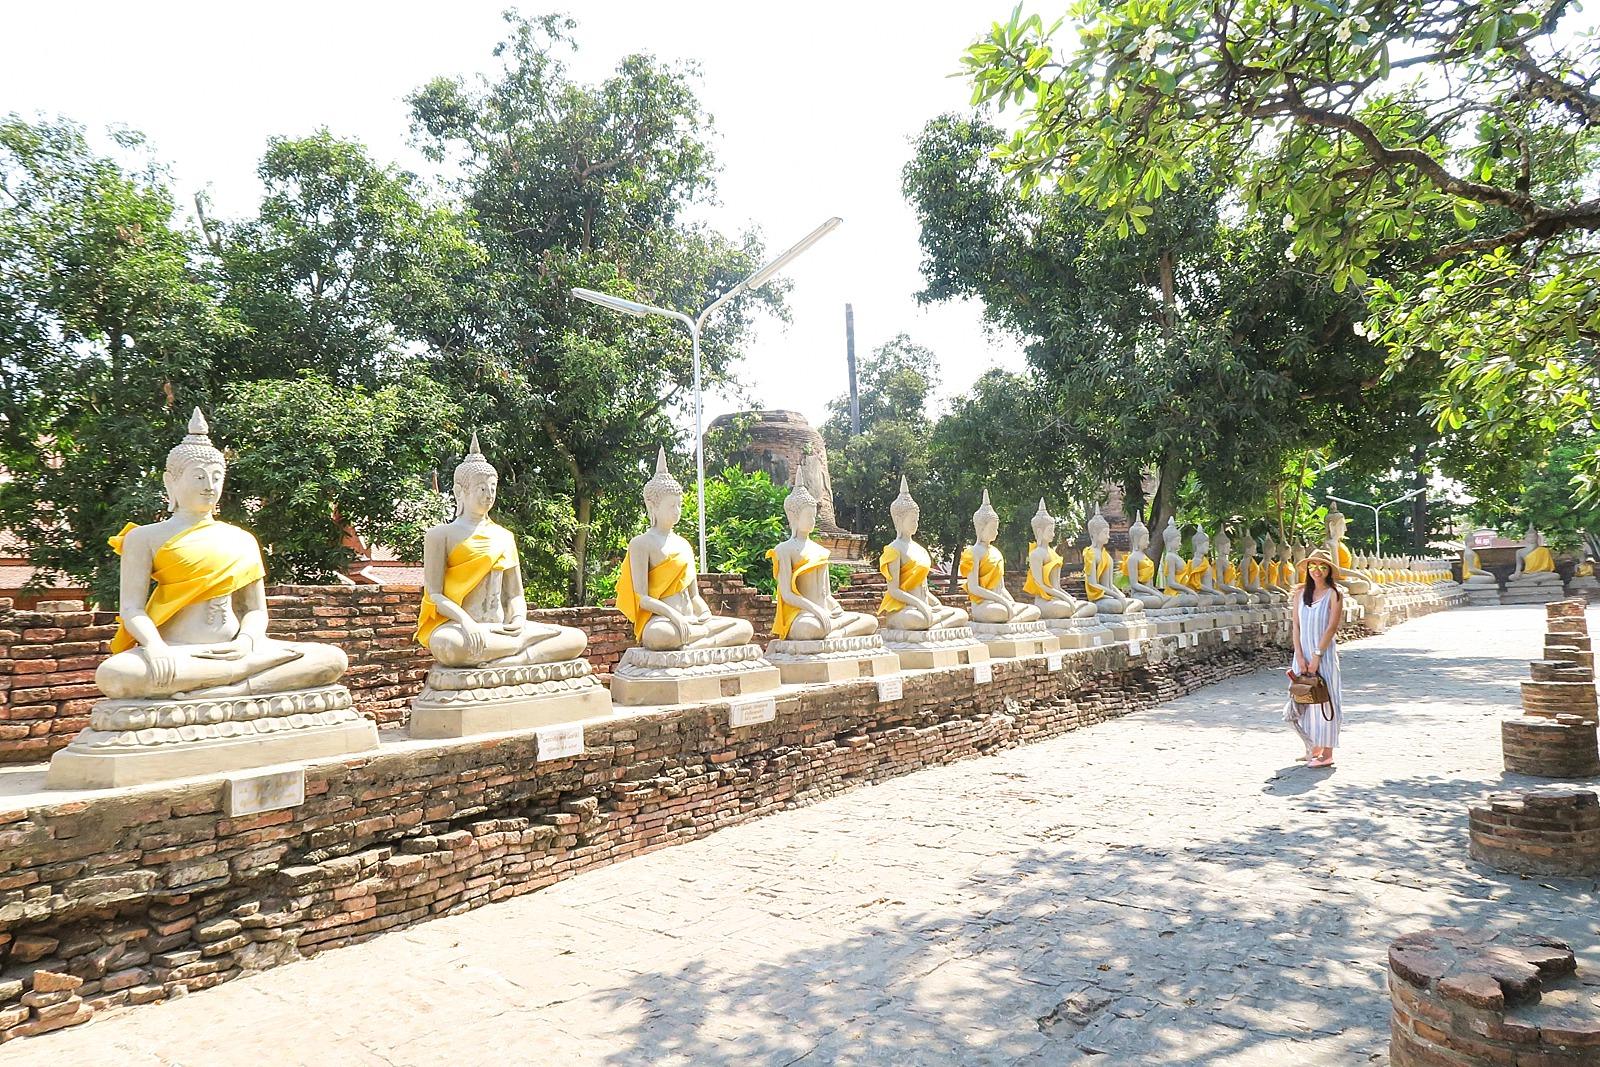 Thailand-diana-elizabeth-travel-blogger-phoenix-339